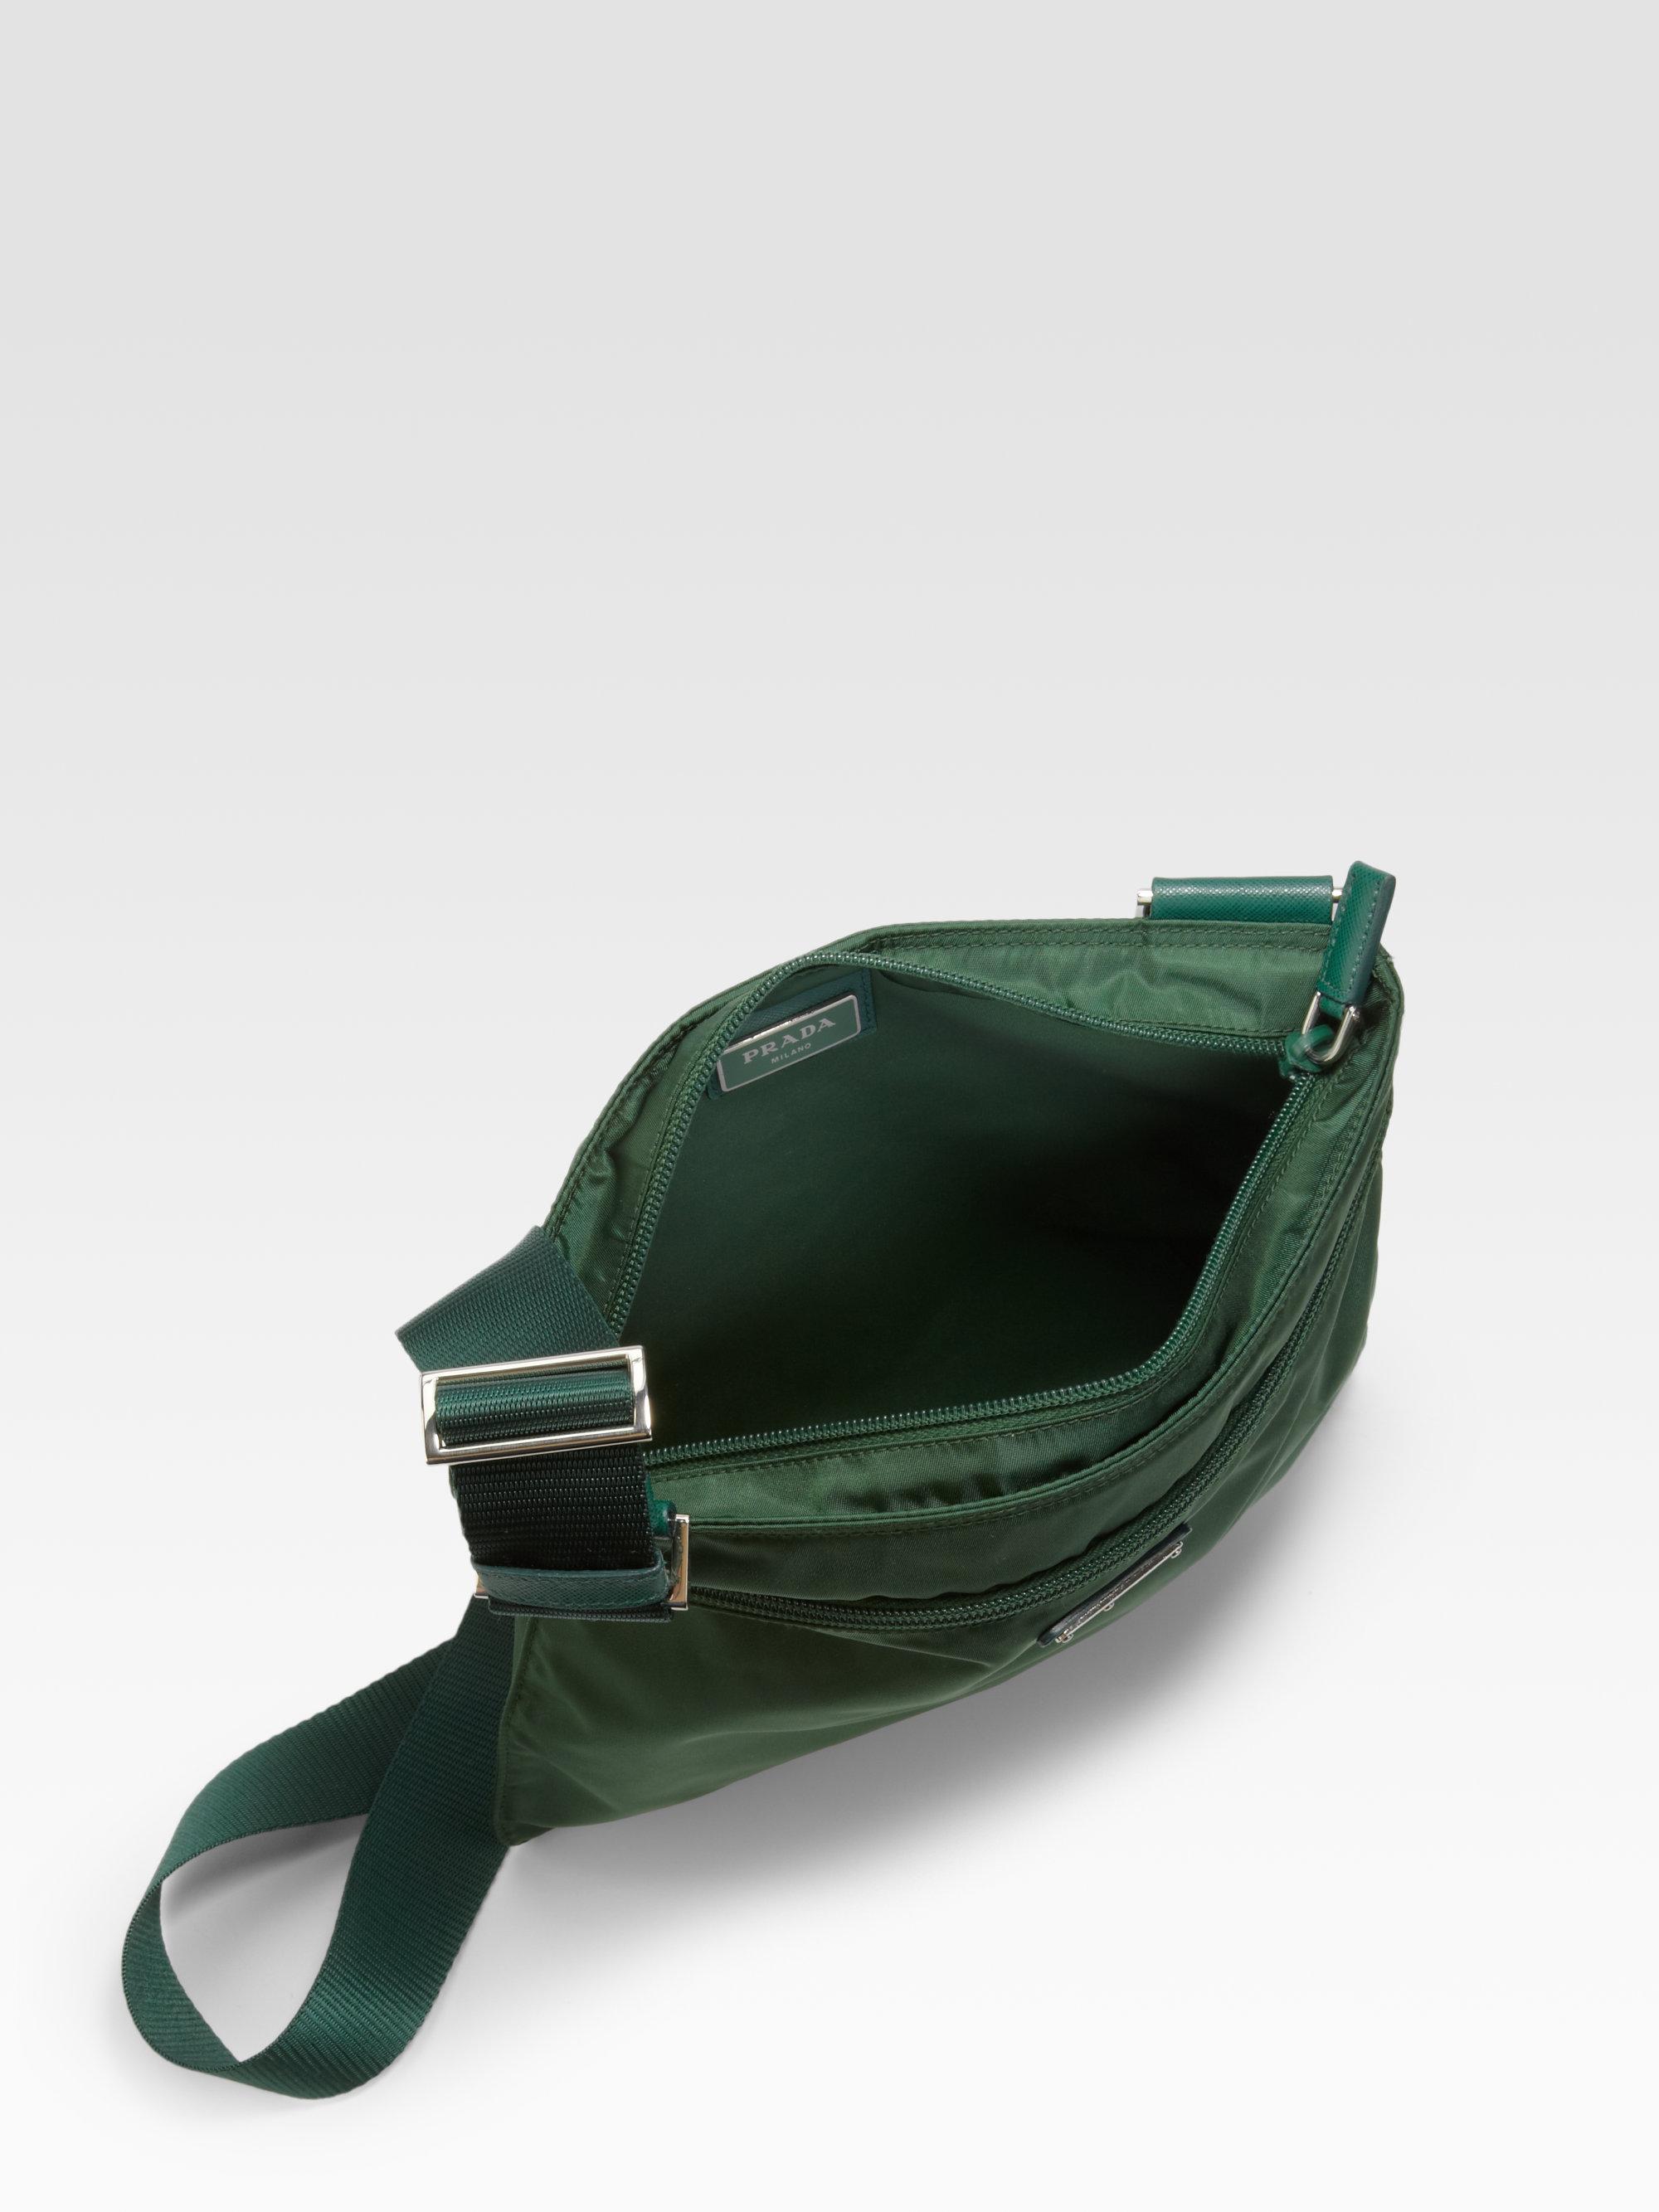 how to tell fake prada sneakers - prada vela small double-pocket messenger bag, pink leather prada purse